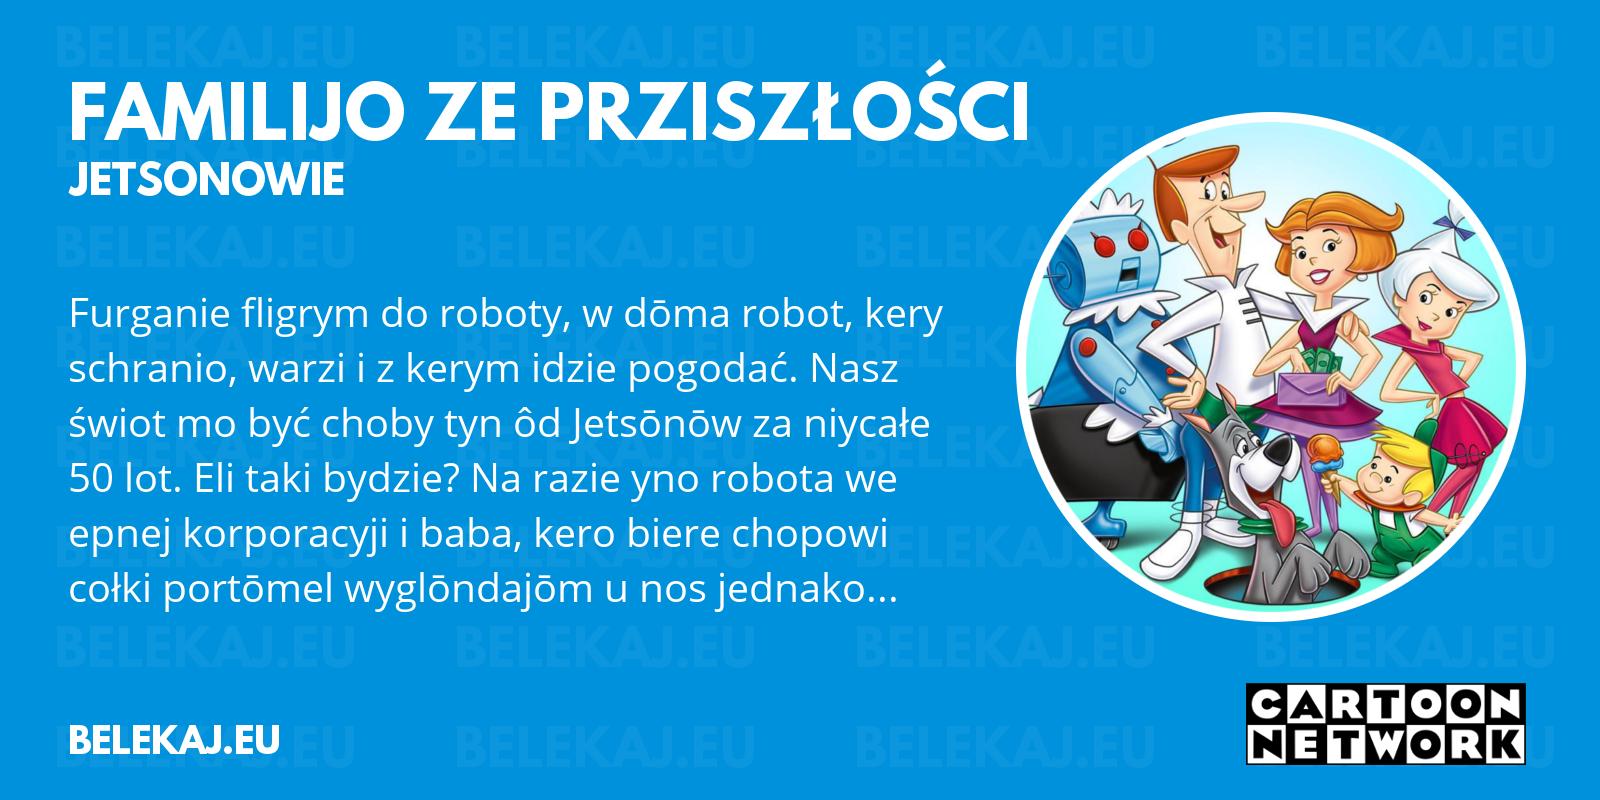 Jetsonowie, Cartoon Network po śląsku - blog bele kaj